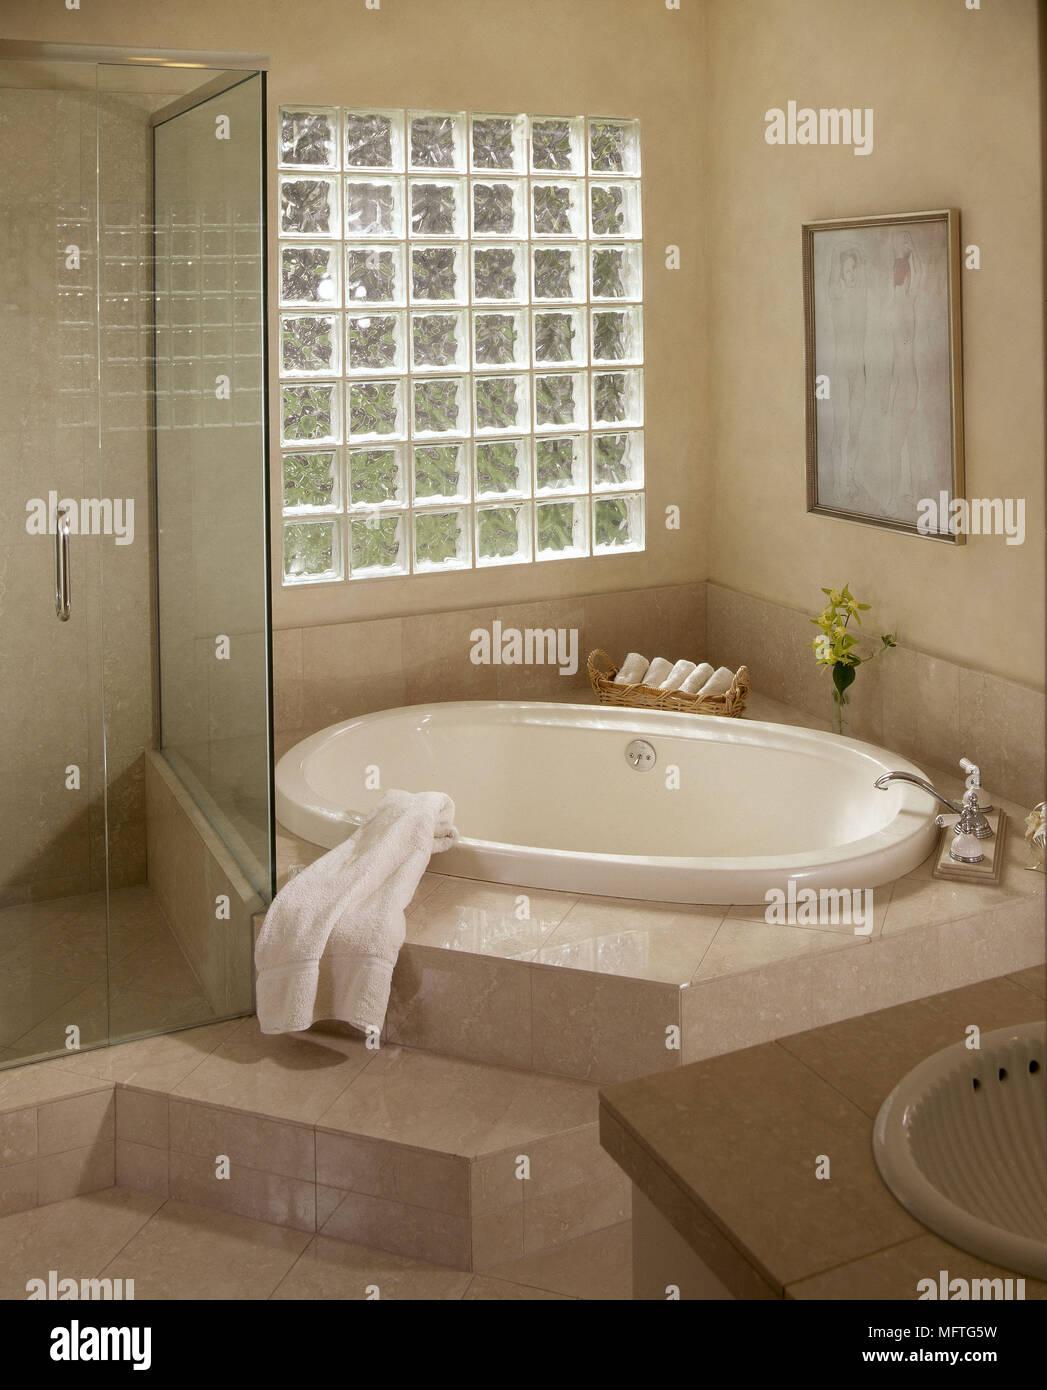 Badezimmer Warme Farben